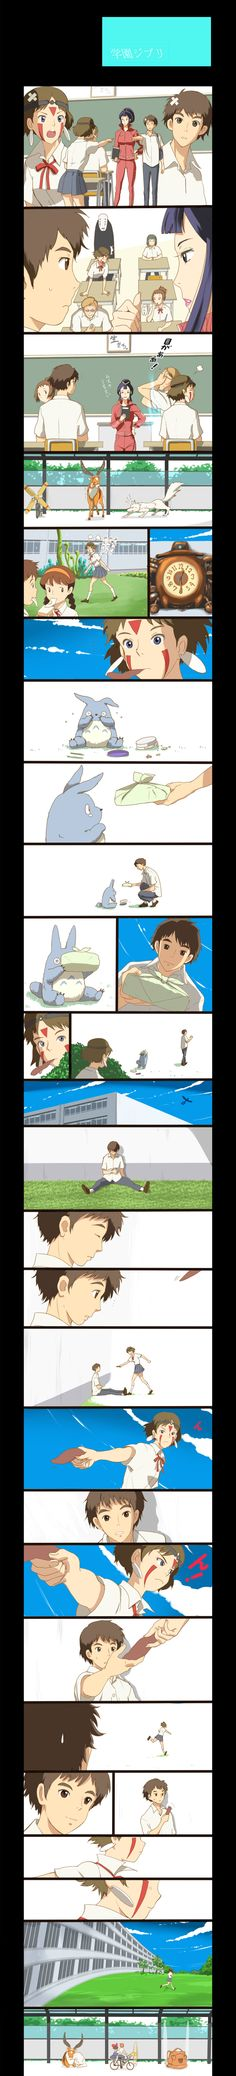 Ghibli Characters at School